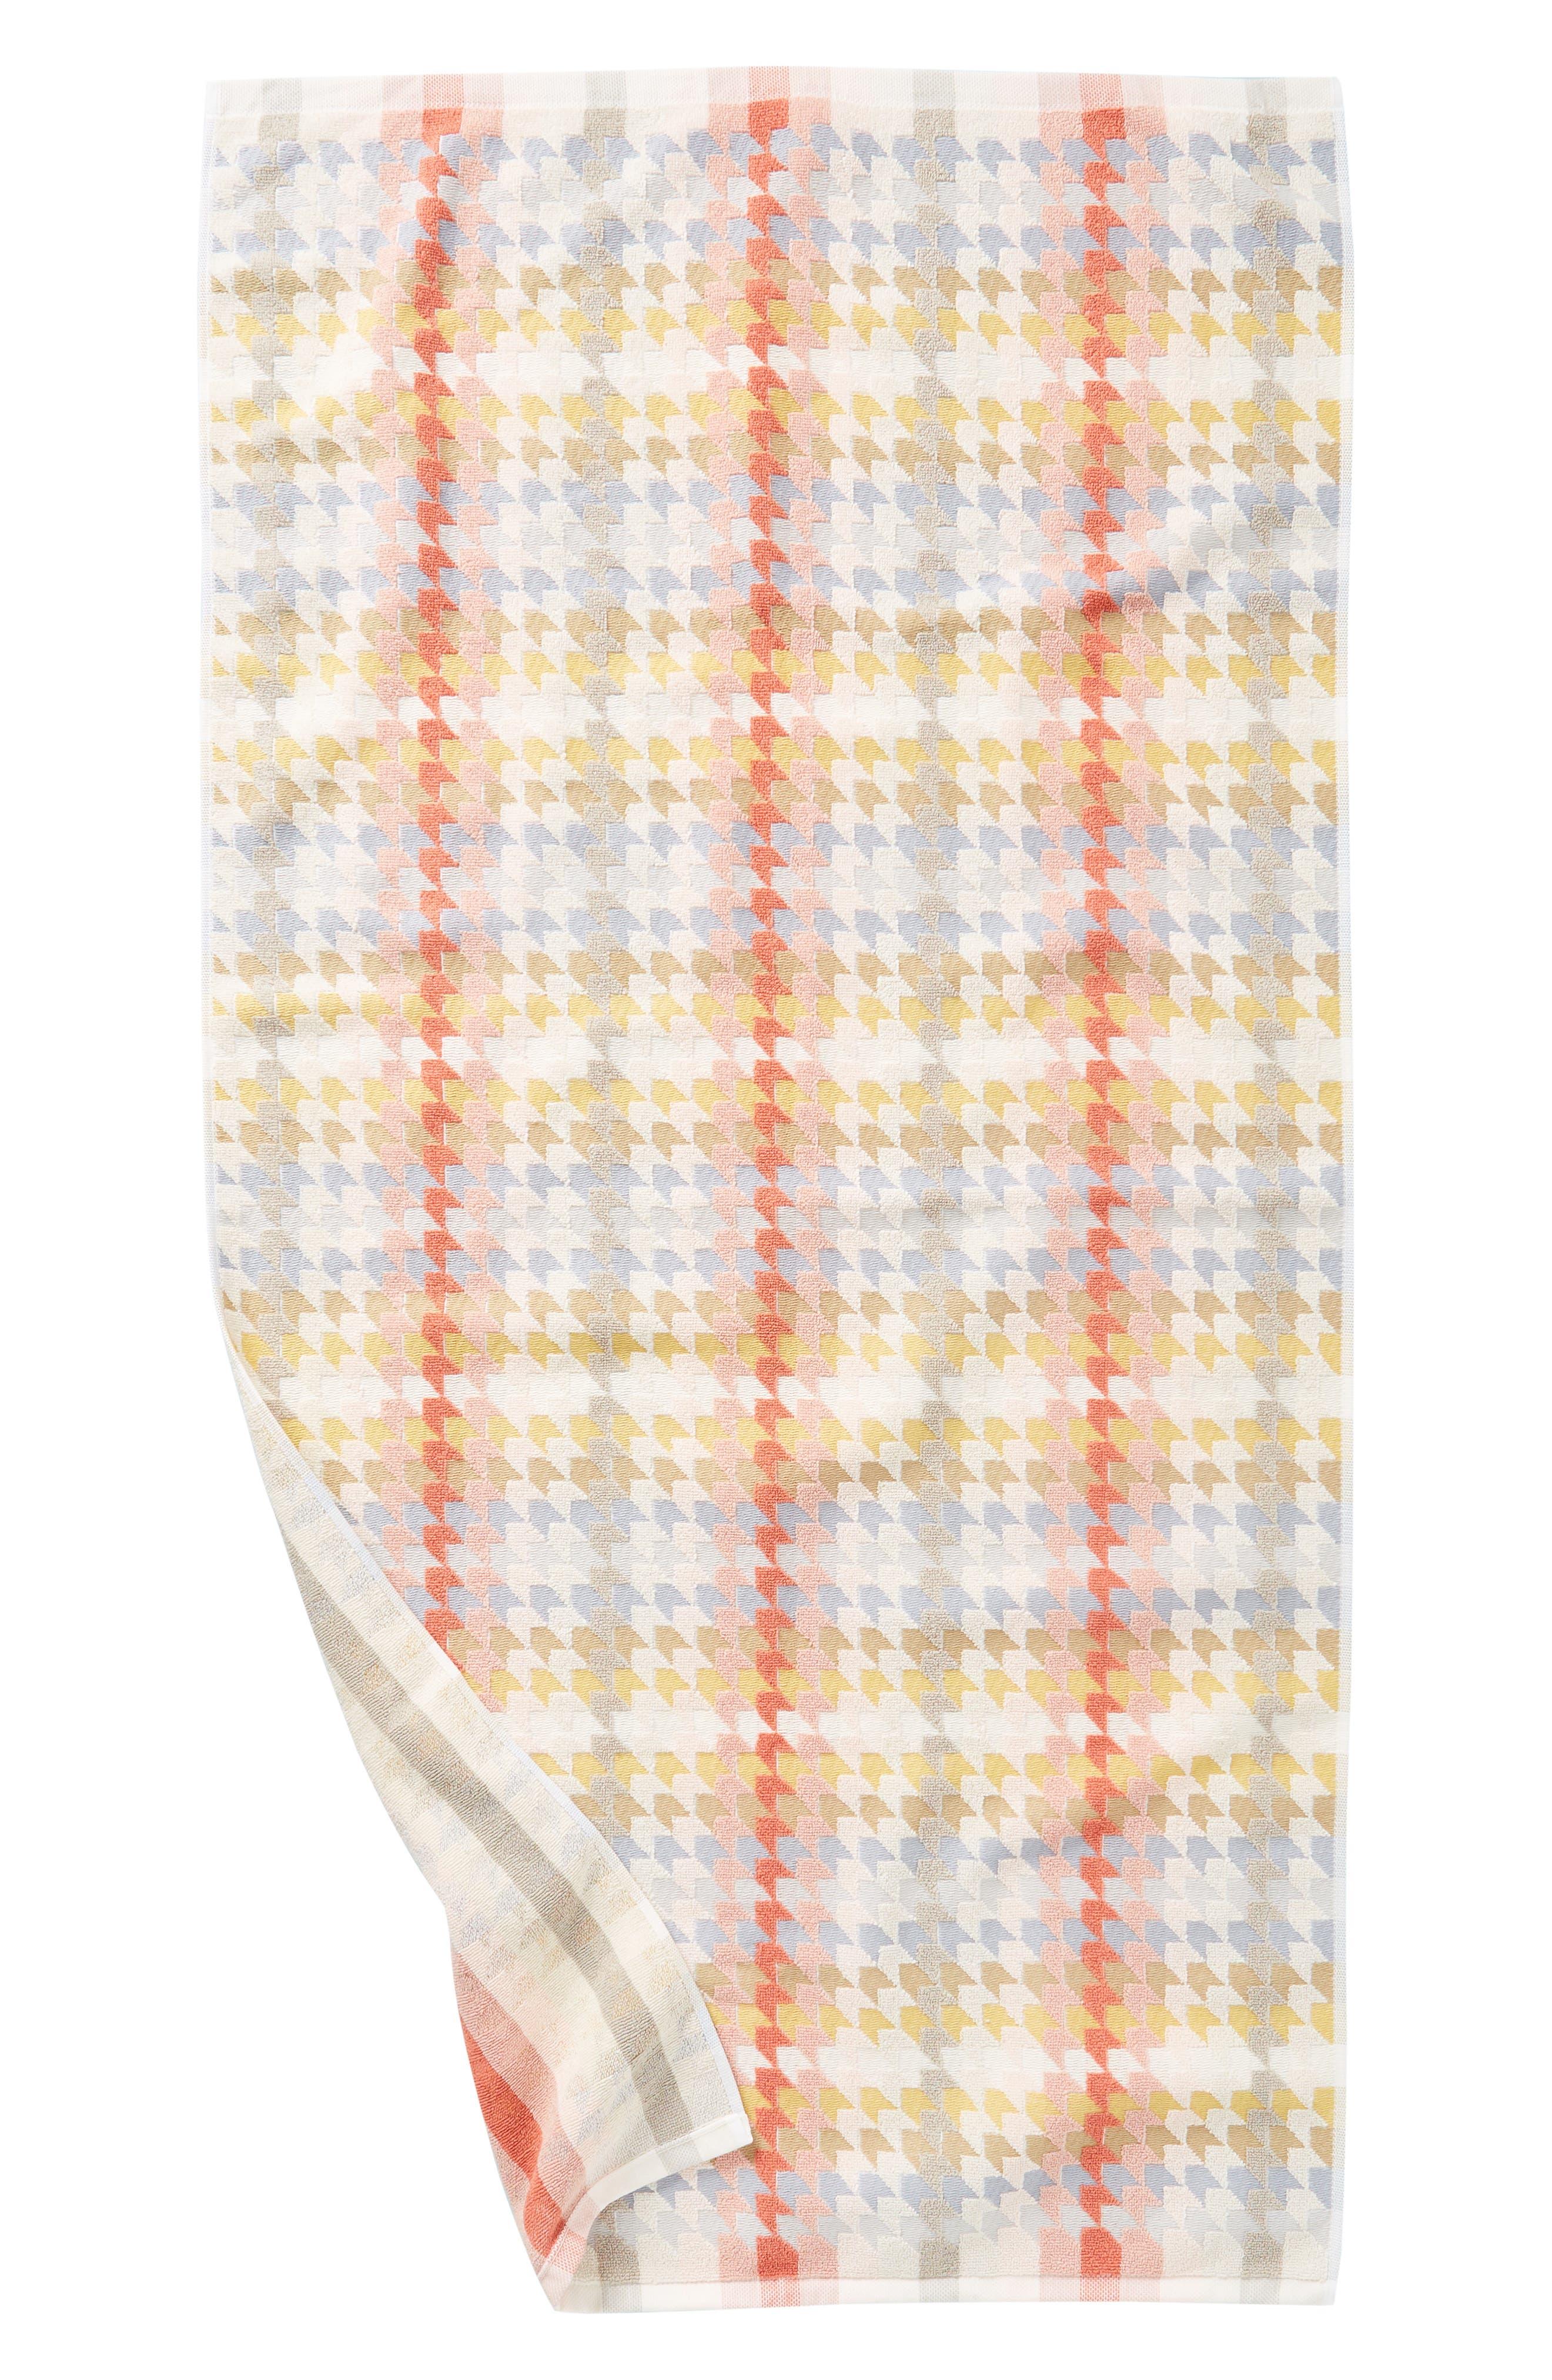 ANTHROPOLOGIE, Noella Bath Towel, Alternate thumbnail 3, color, ORANGE COMBO